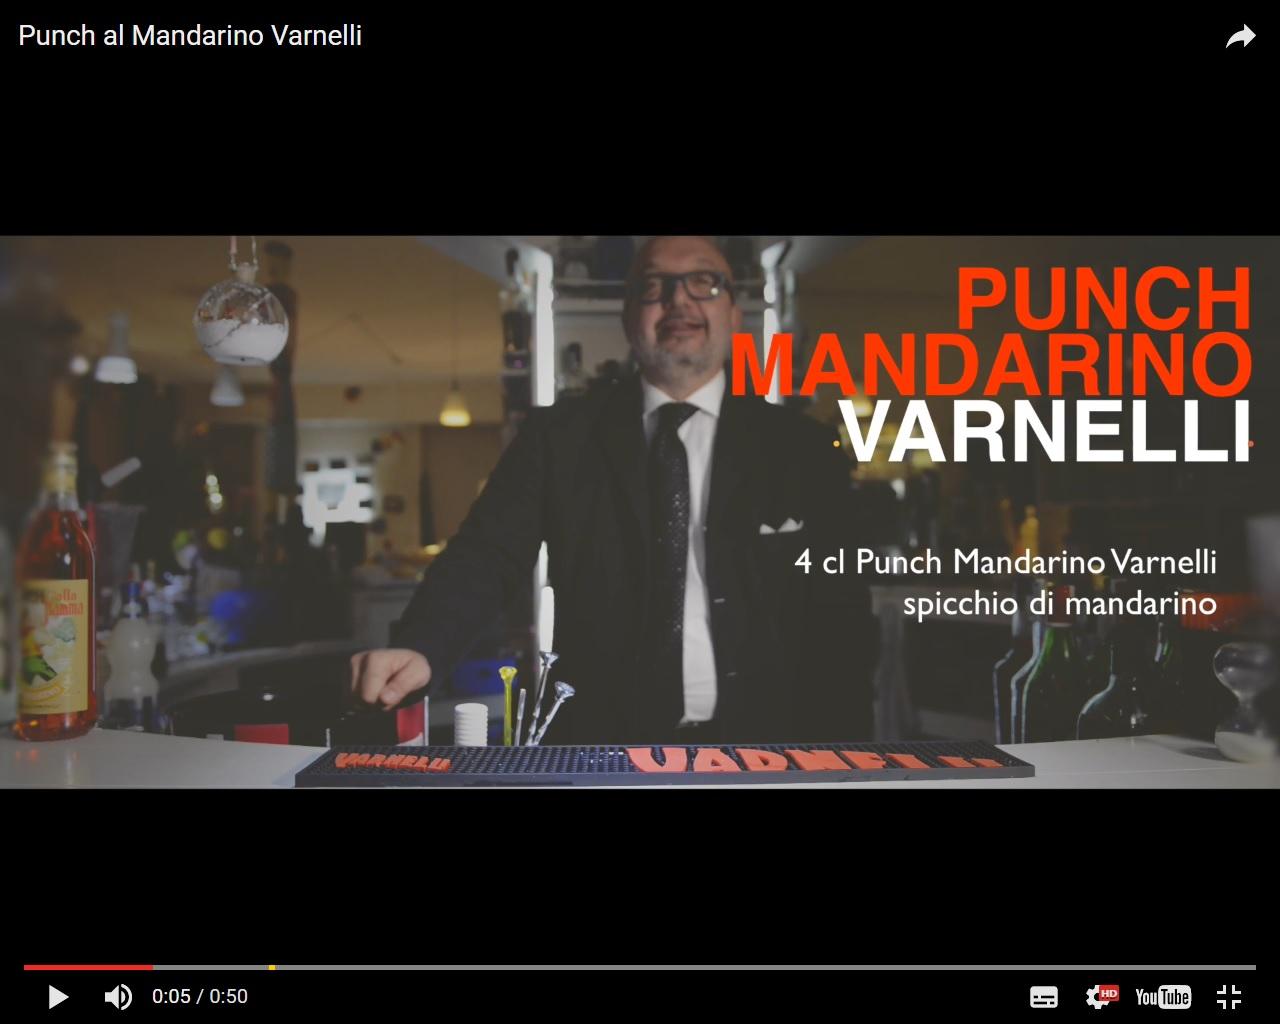 Punch Mandarino Varnelli